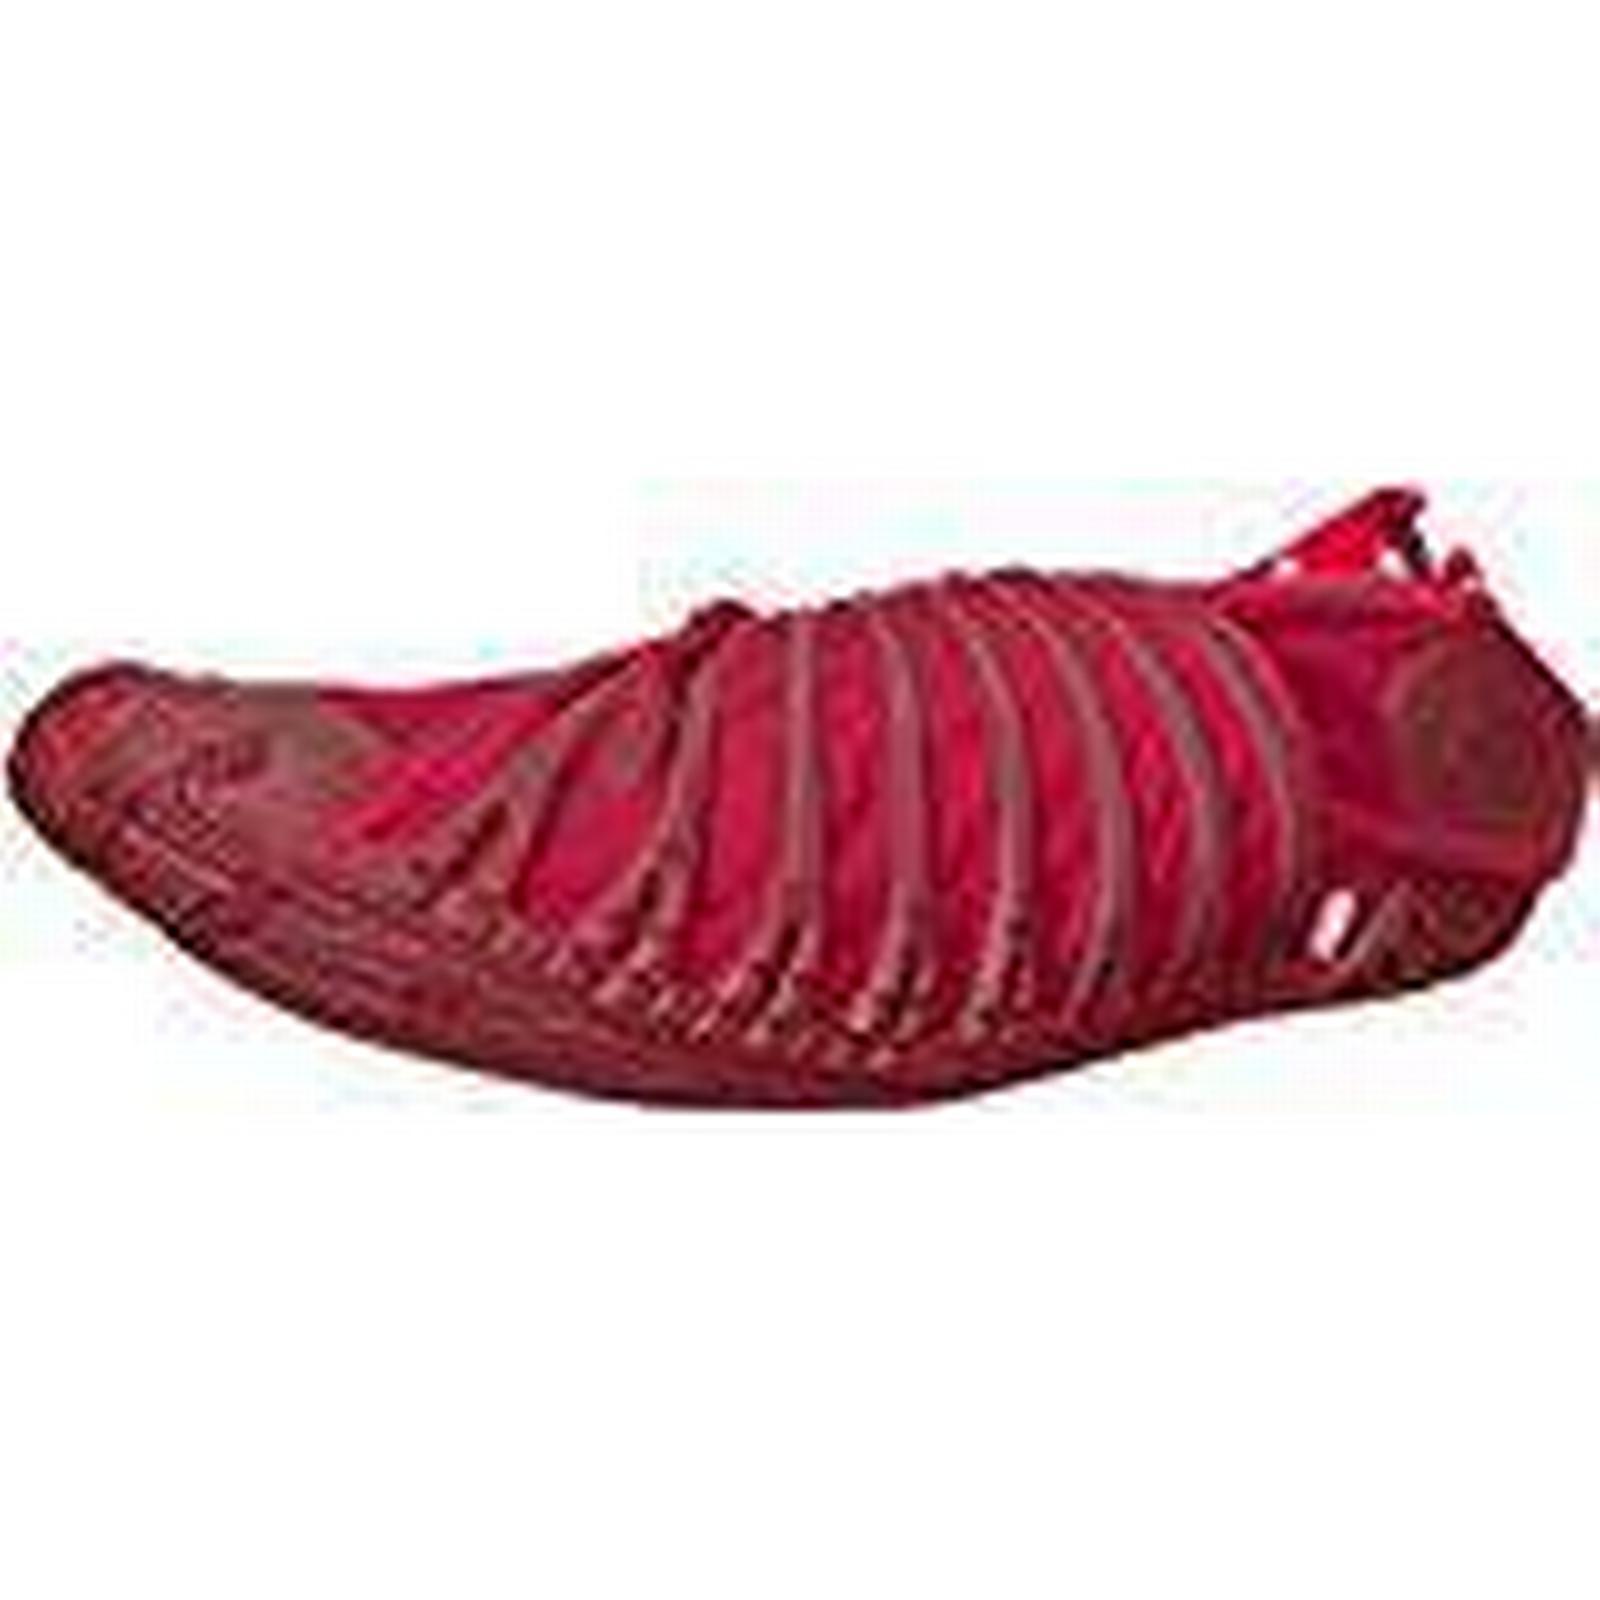 Vibram Low-Top FiveFingers Women''s Furoshiki Original Low-Top Vibram Sneakers, Beet Red, 9/9.5 UK a79ef2